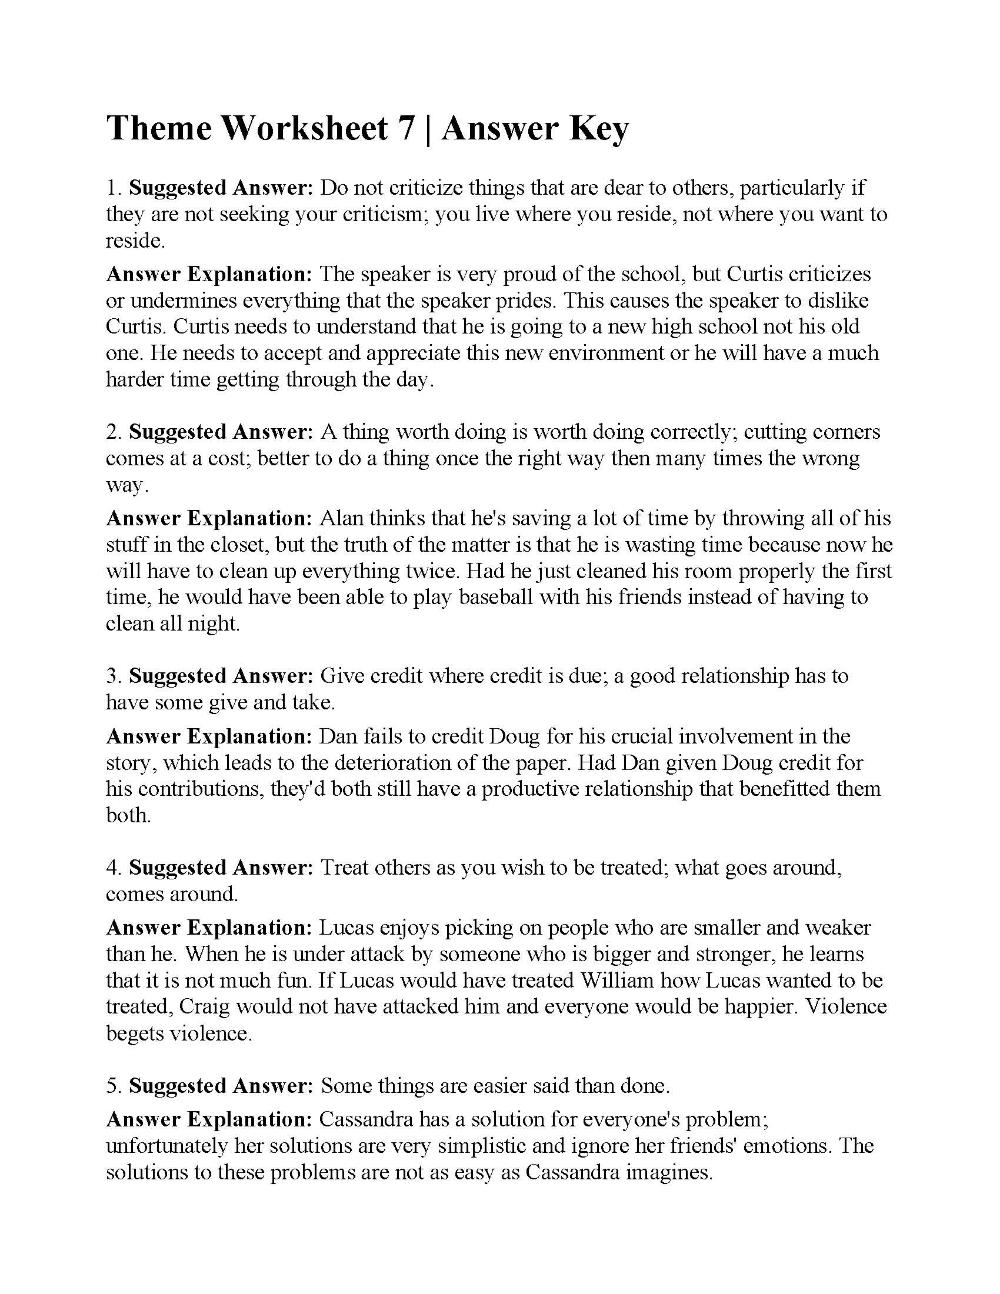 Theme Worksheet 7 | Answers | desktop | Reading worksheets ...